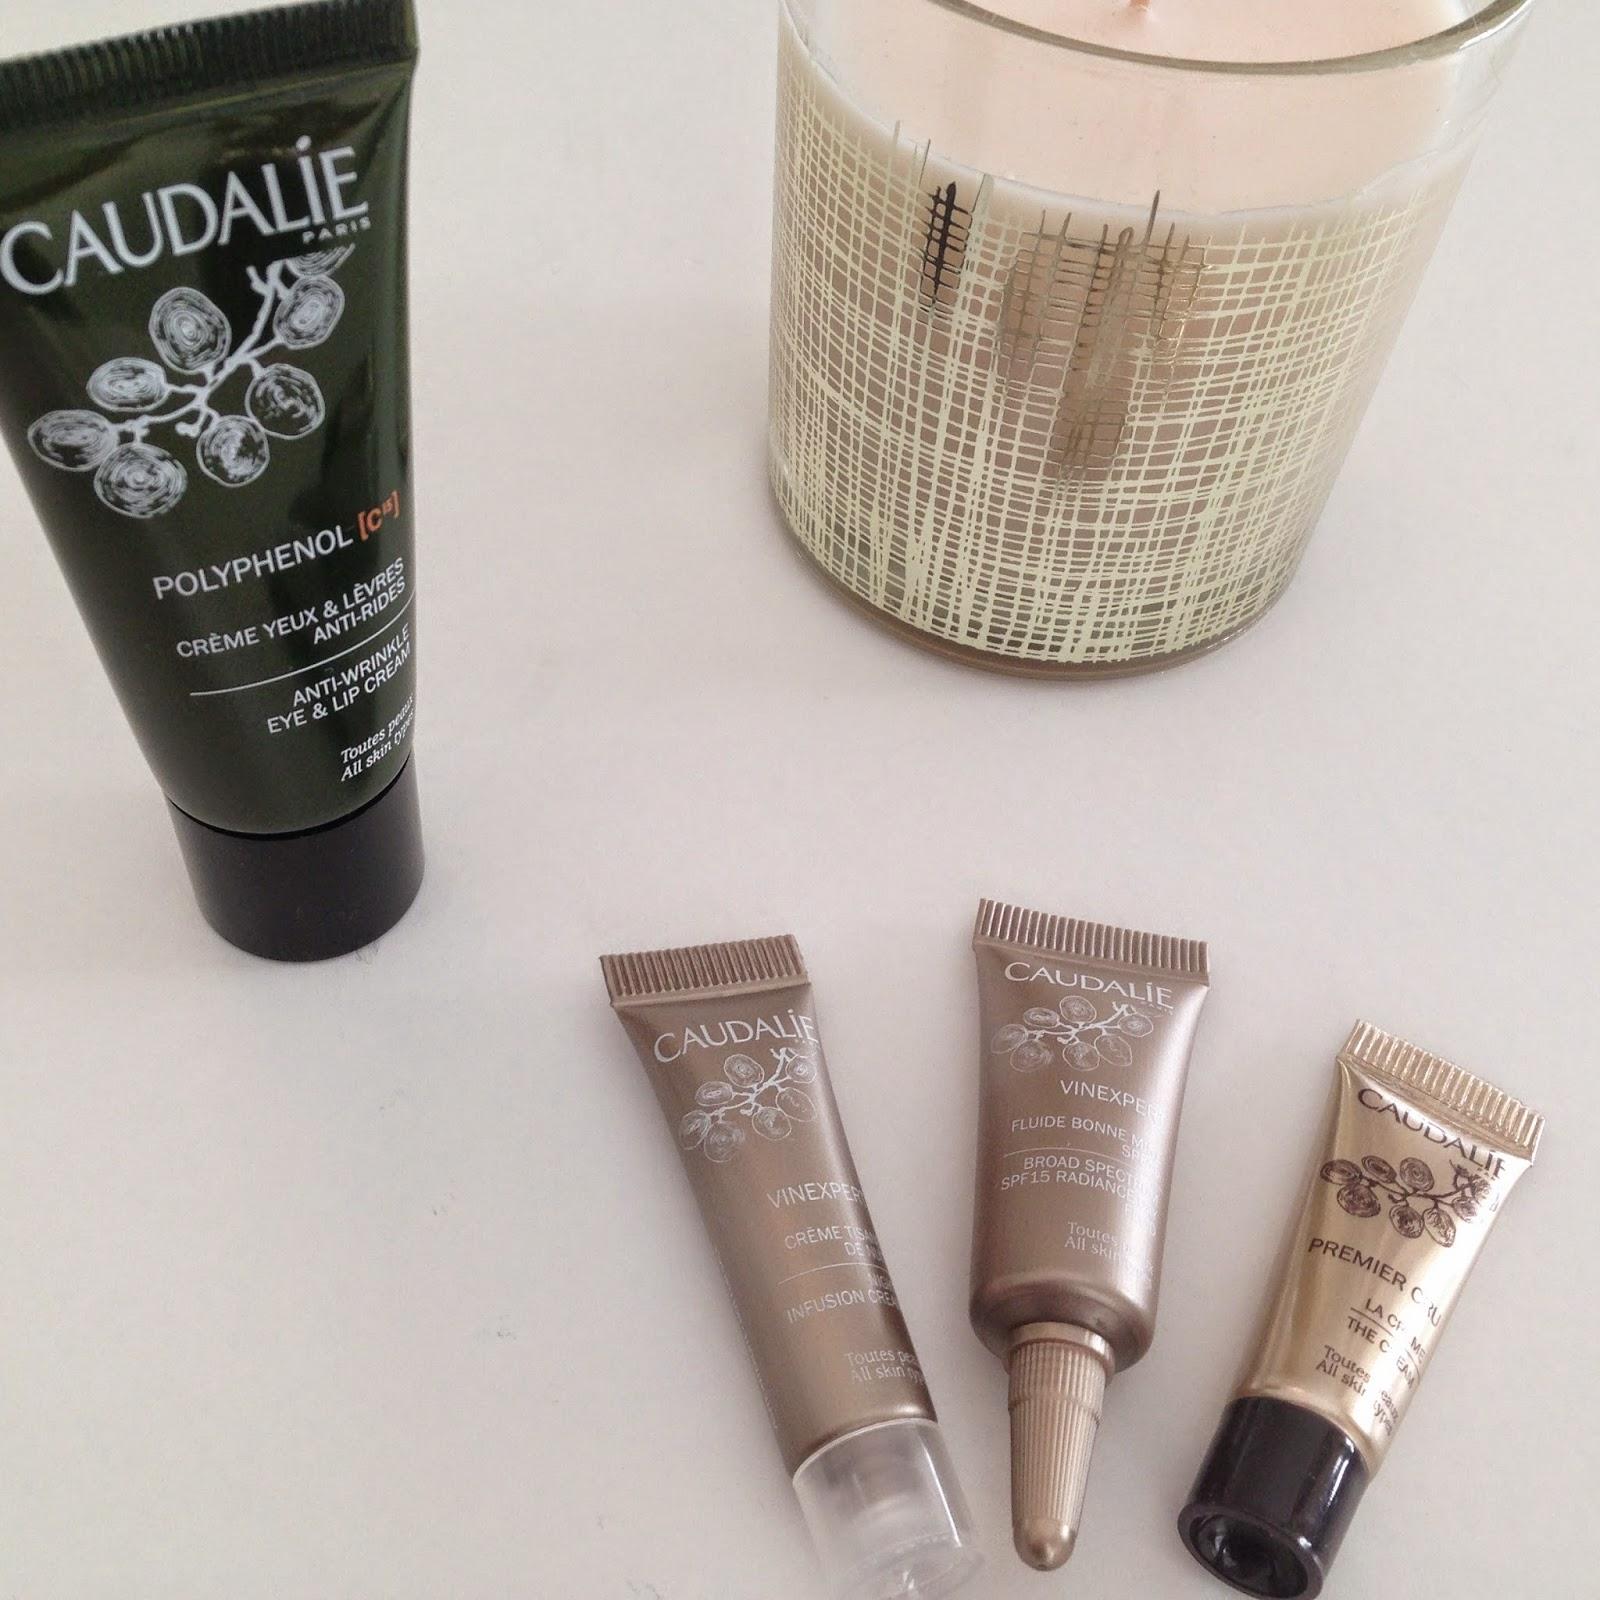 Caudalie-anti-ageing-samples